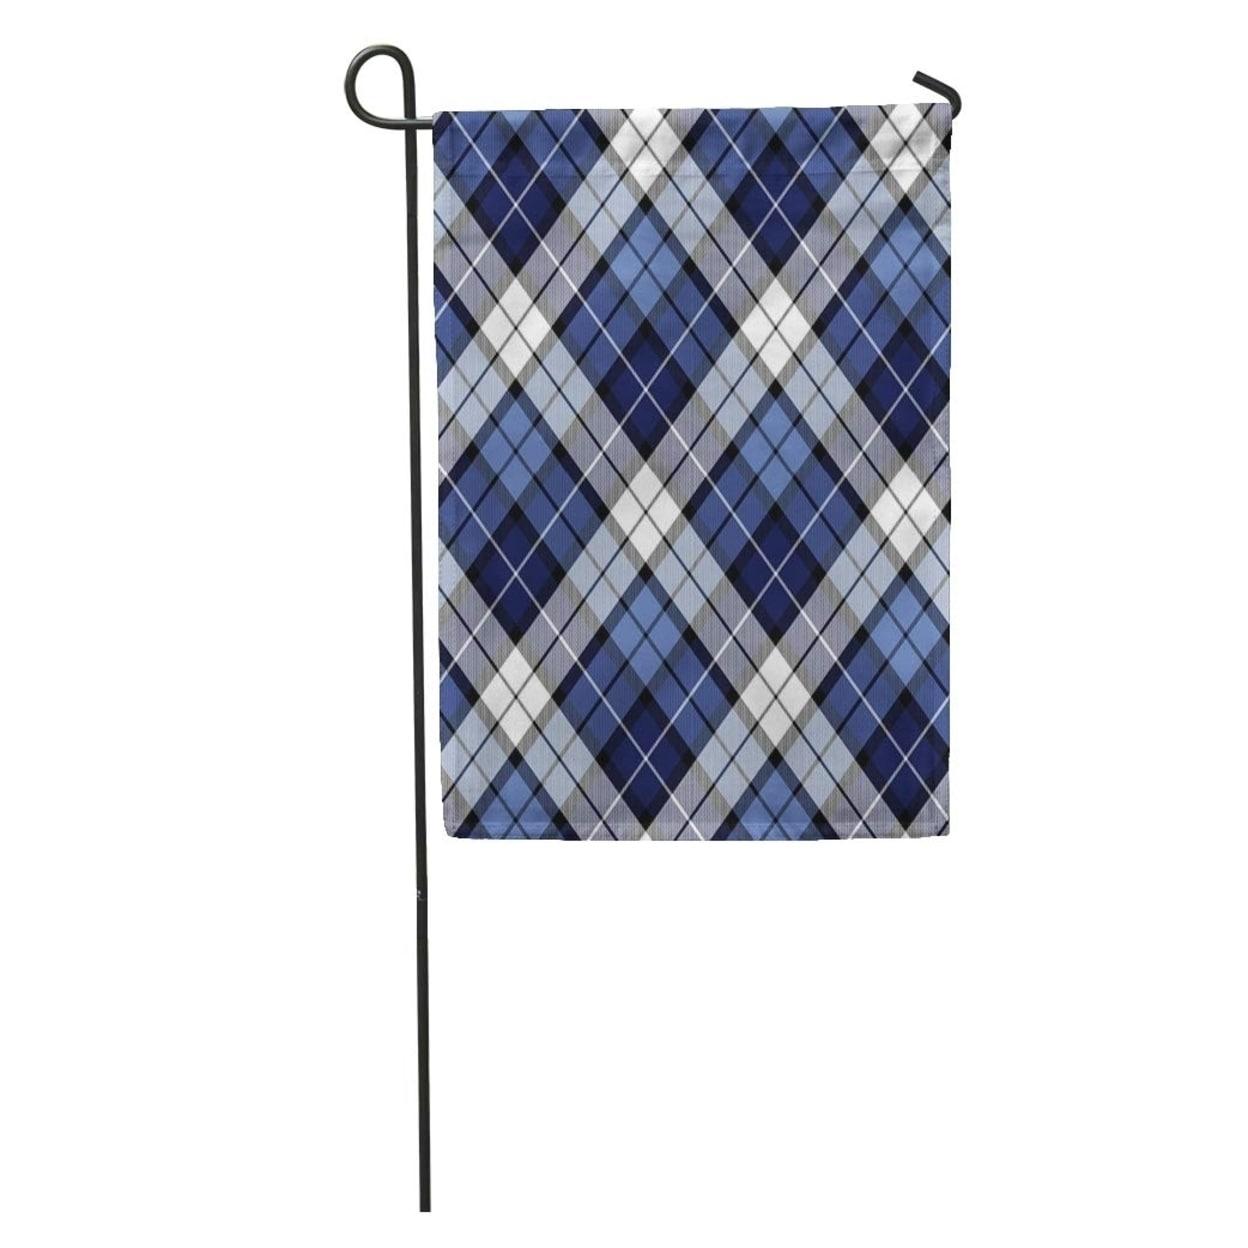 Scottish Checkered and HOME Garden Flag House Decor Waterproof Yard Banner